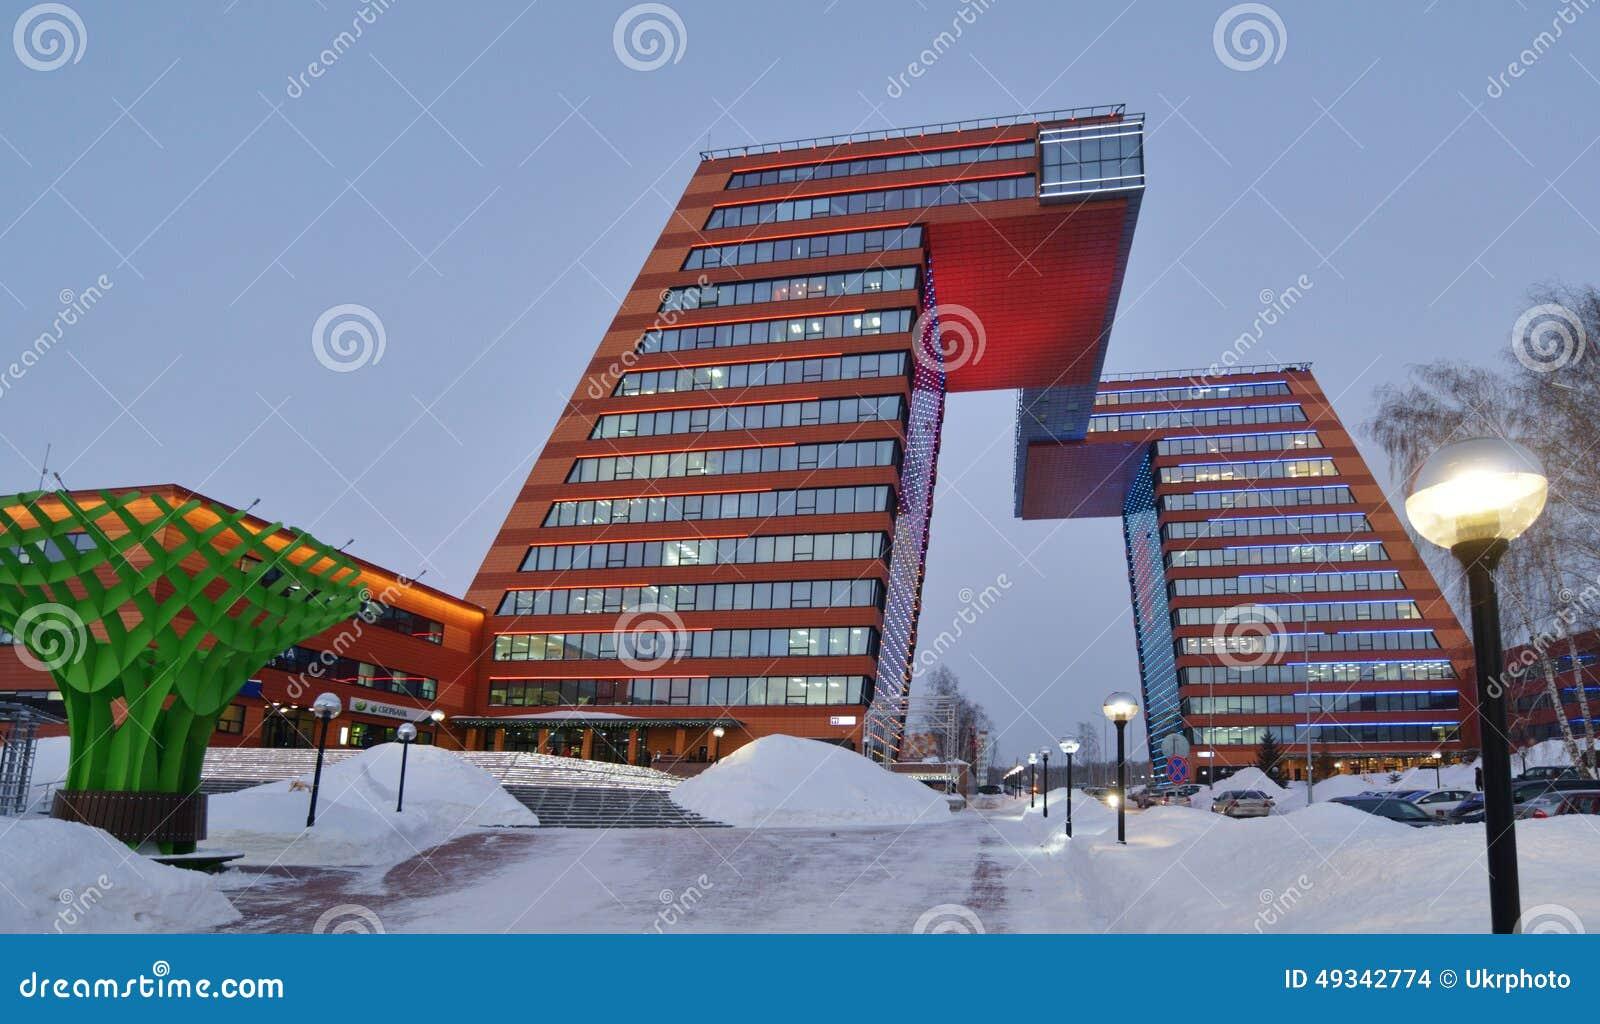 Technologies in Novosibirsk 73